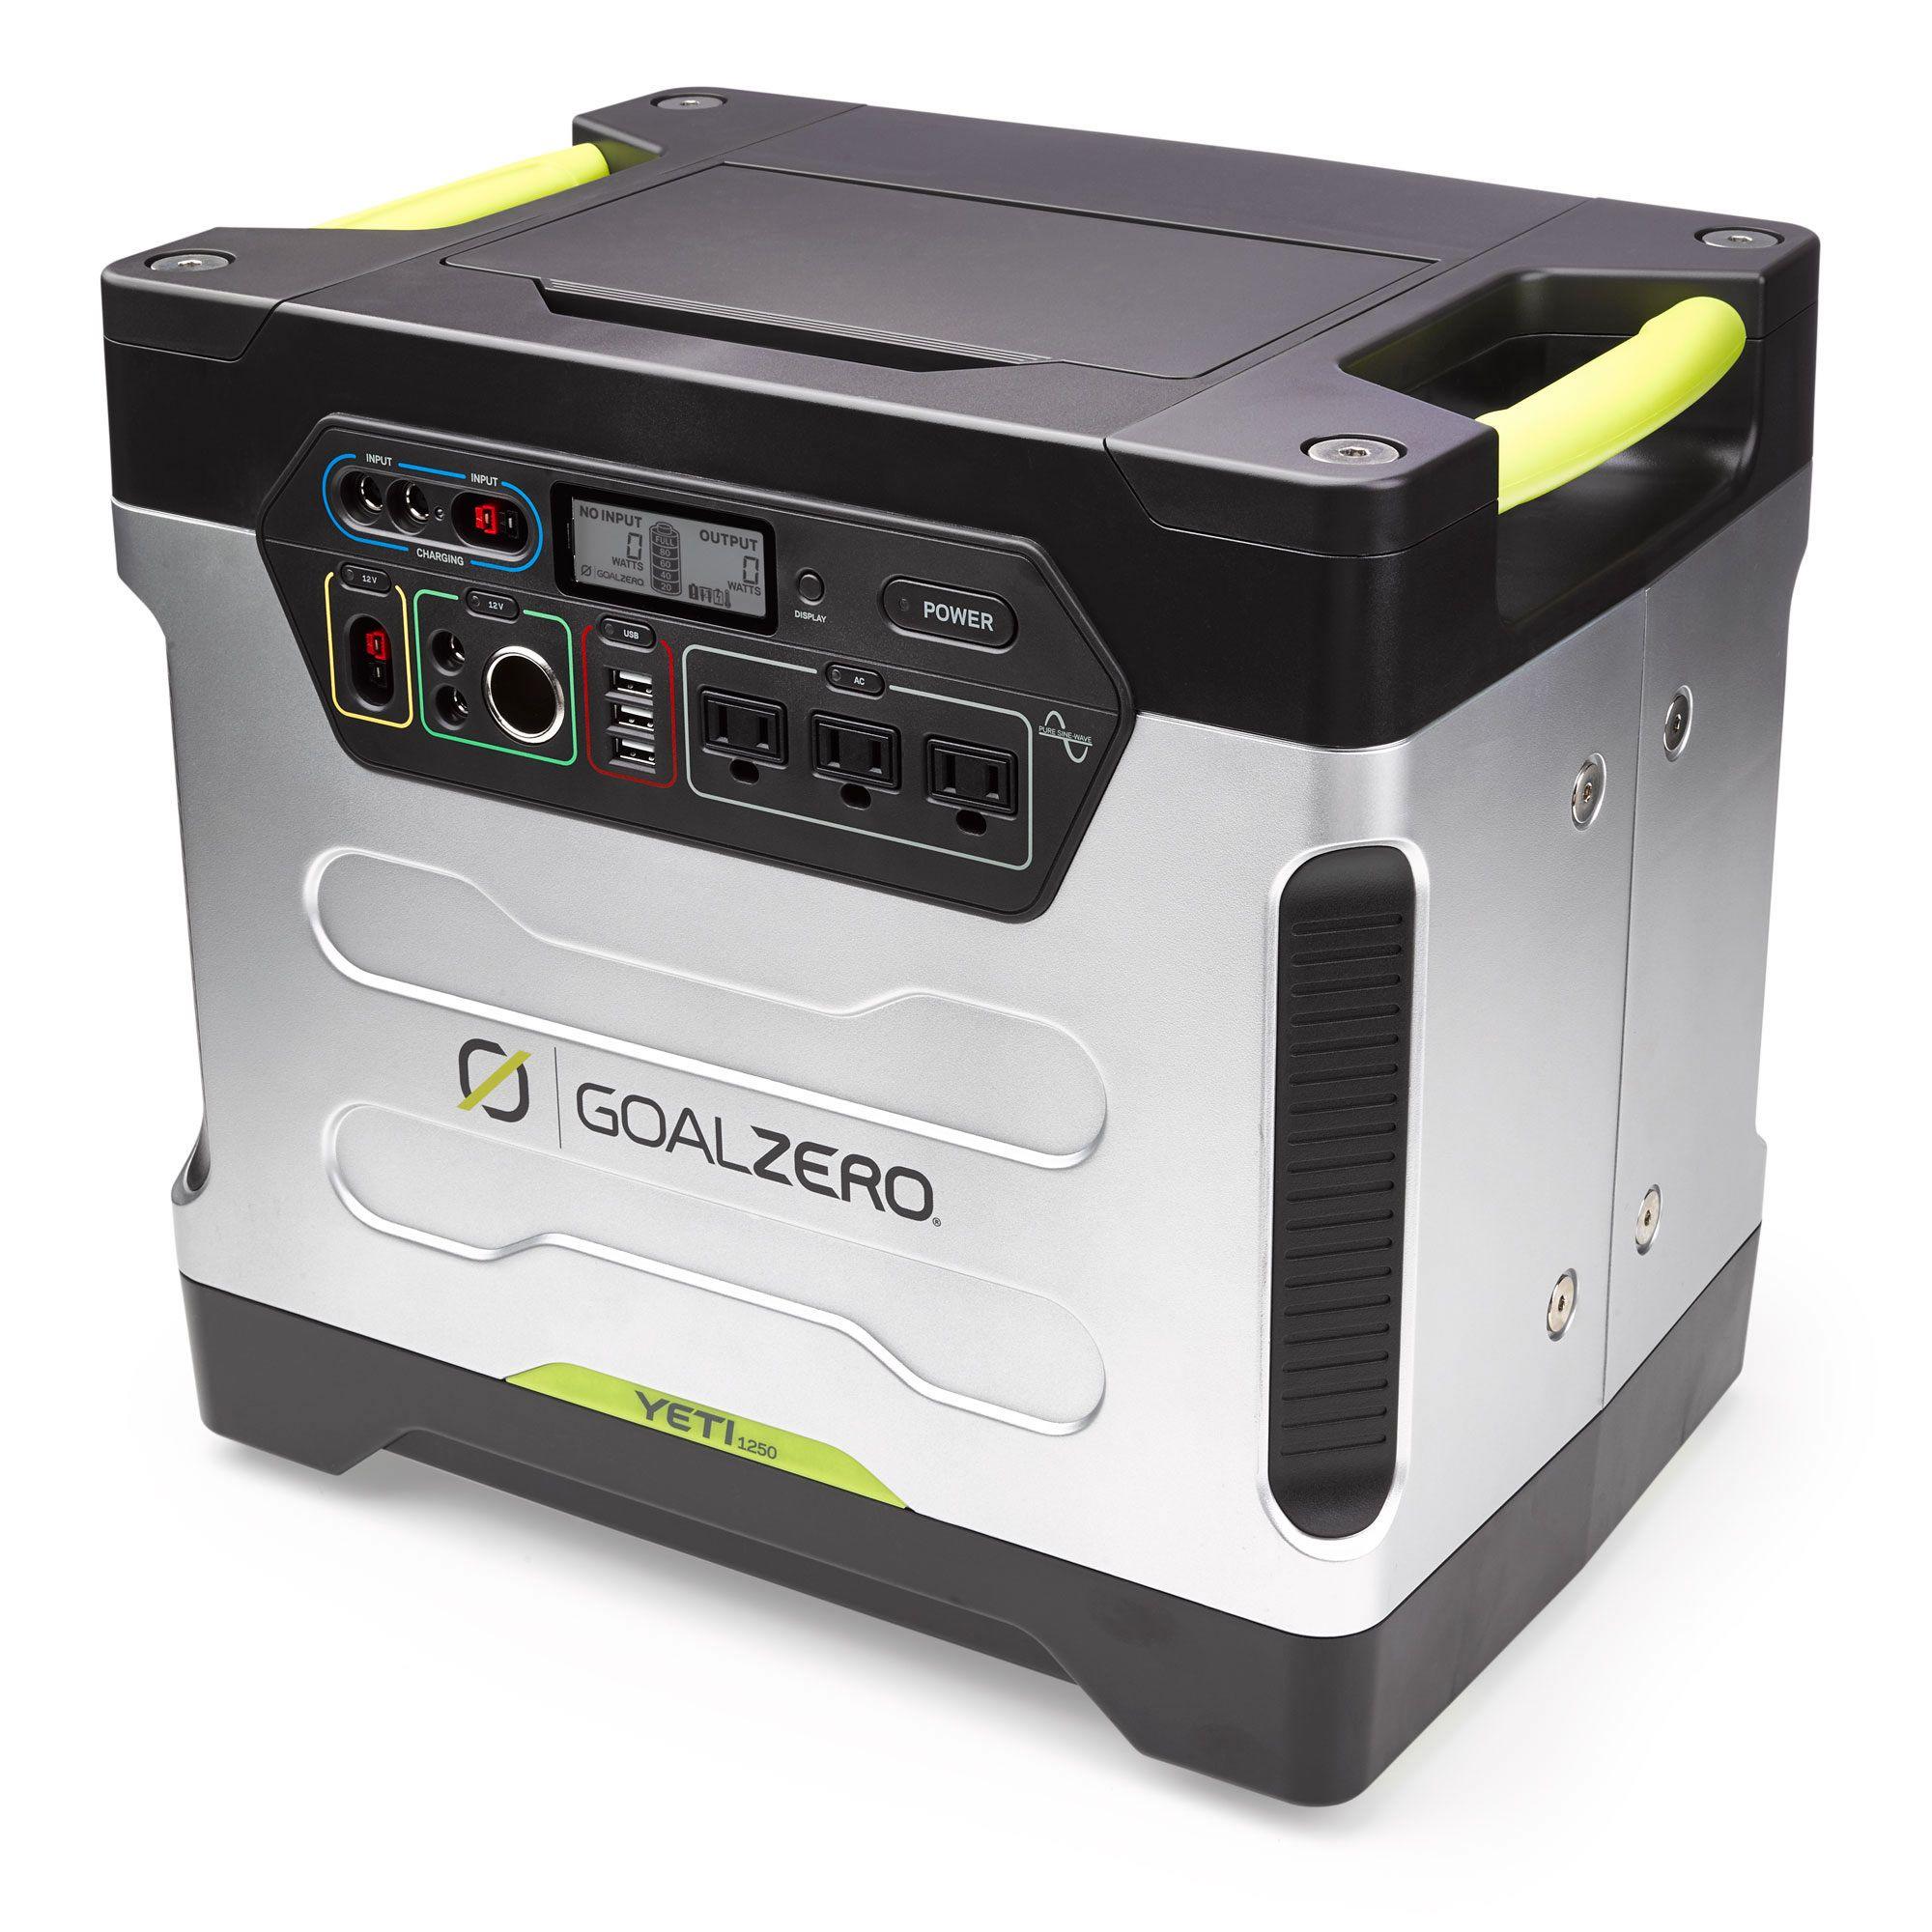 Yeti 1250 Portable Power Station Solar Generator Goal Zero Goal Zero Solar Panels Solar Power Panels Best Solar Panels